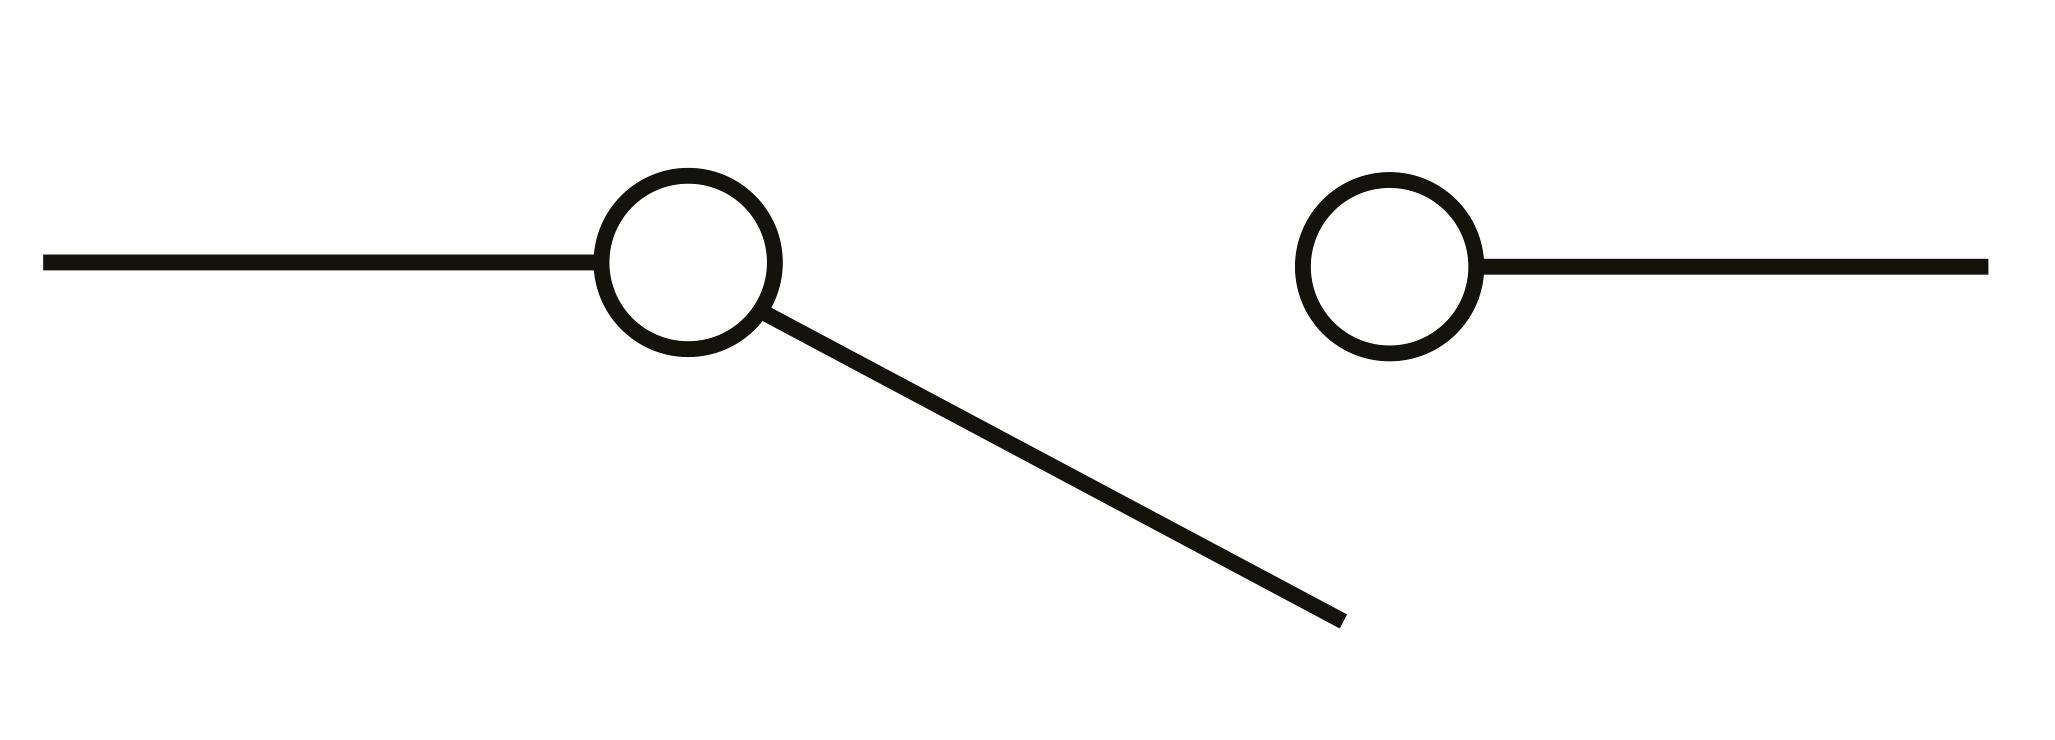 2 way switch symbol